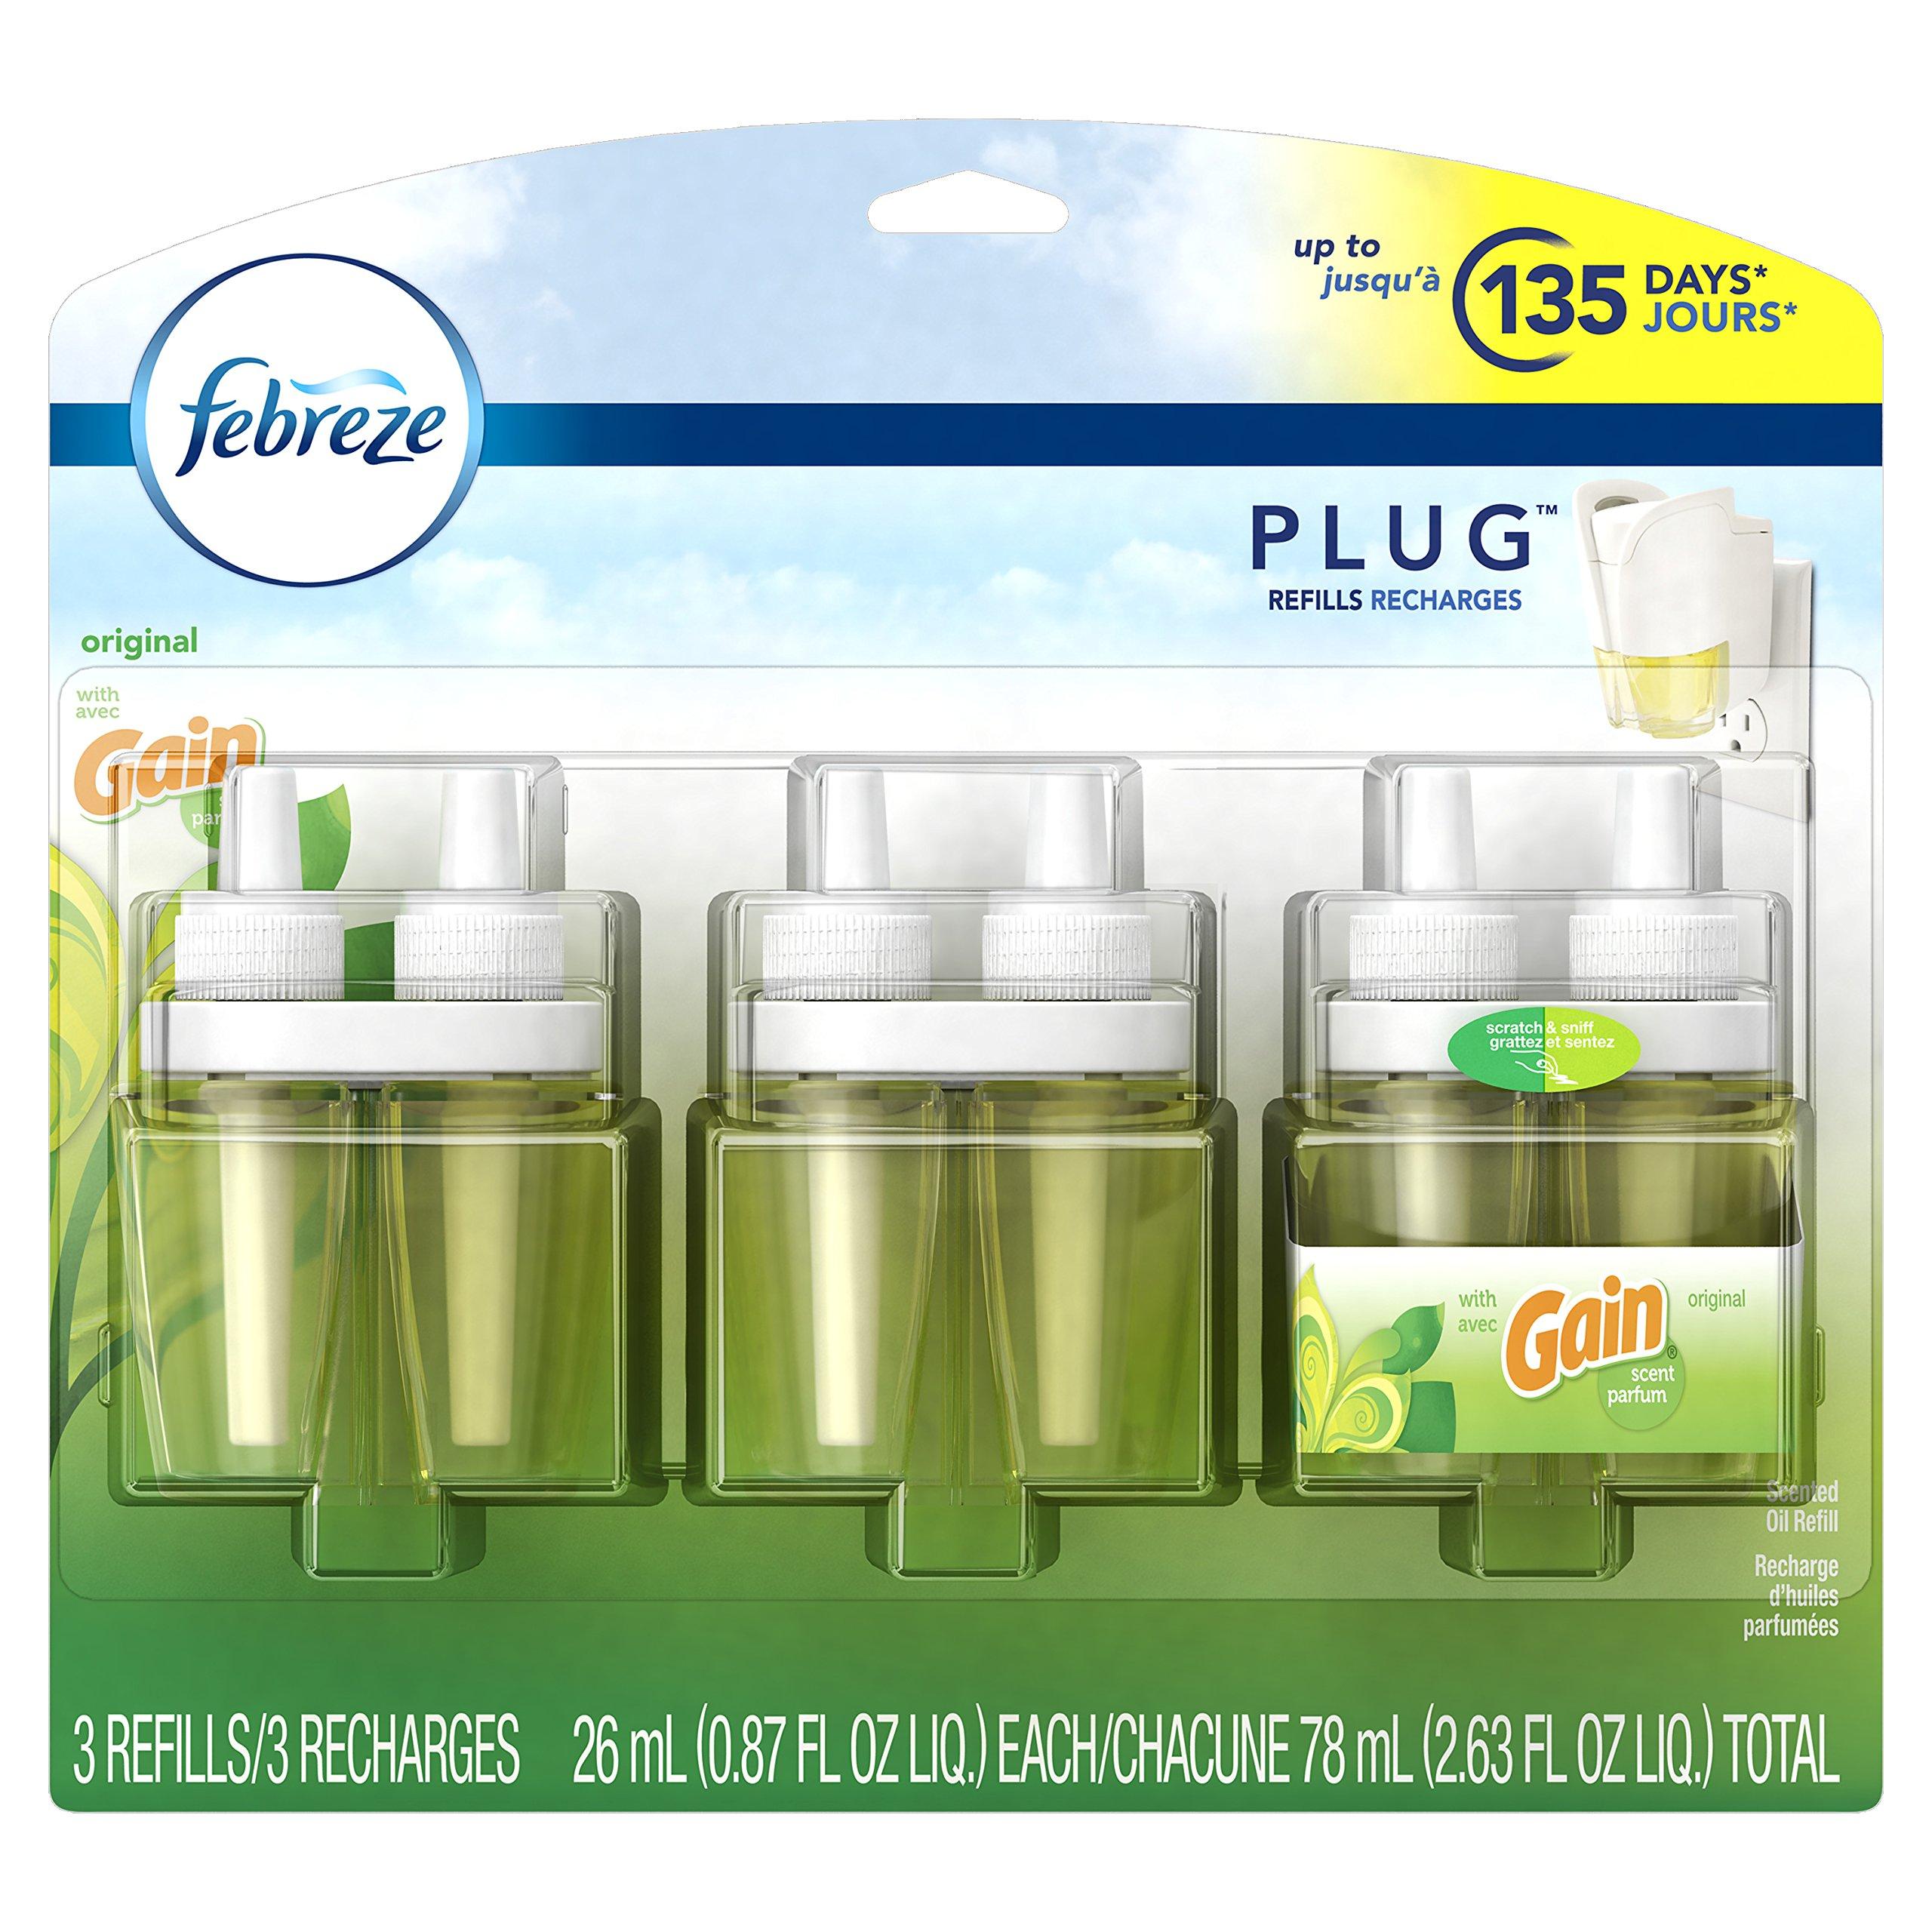 Febreze PLUG Air Freshener Refills with Gain Original (3 Count, 2.63 oz)